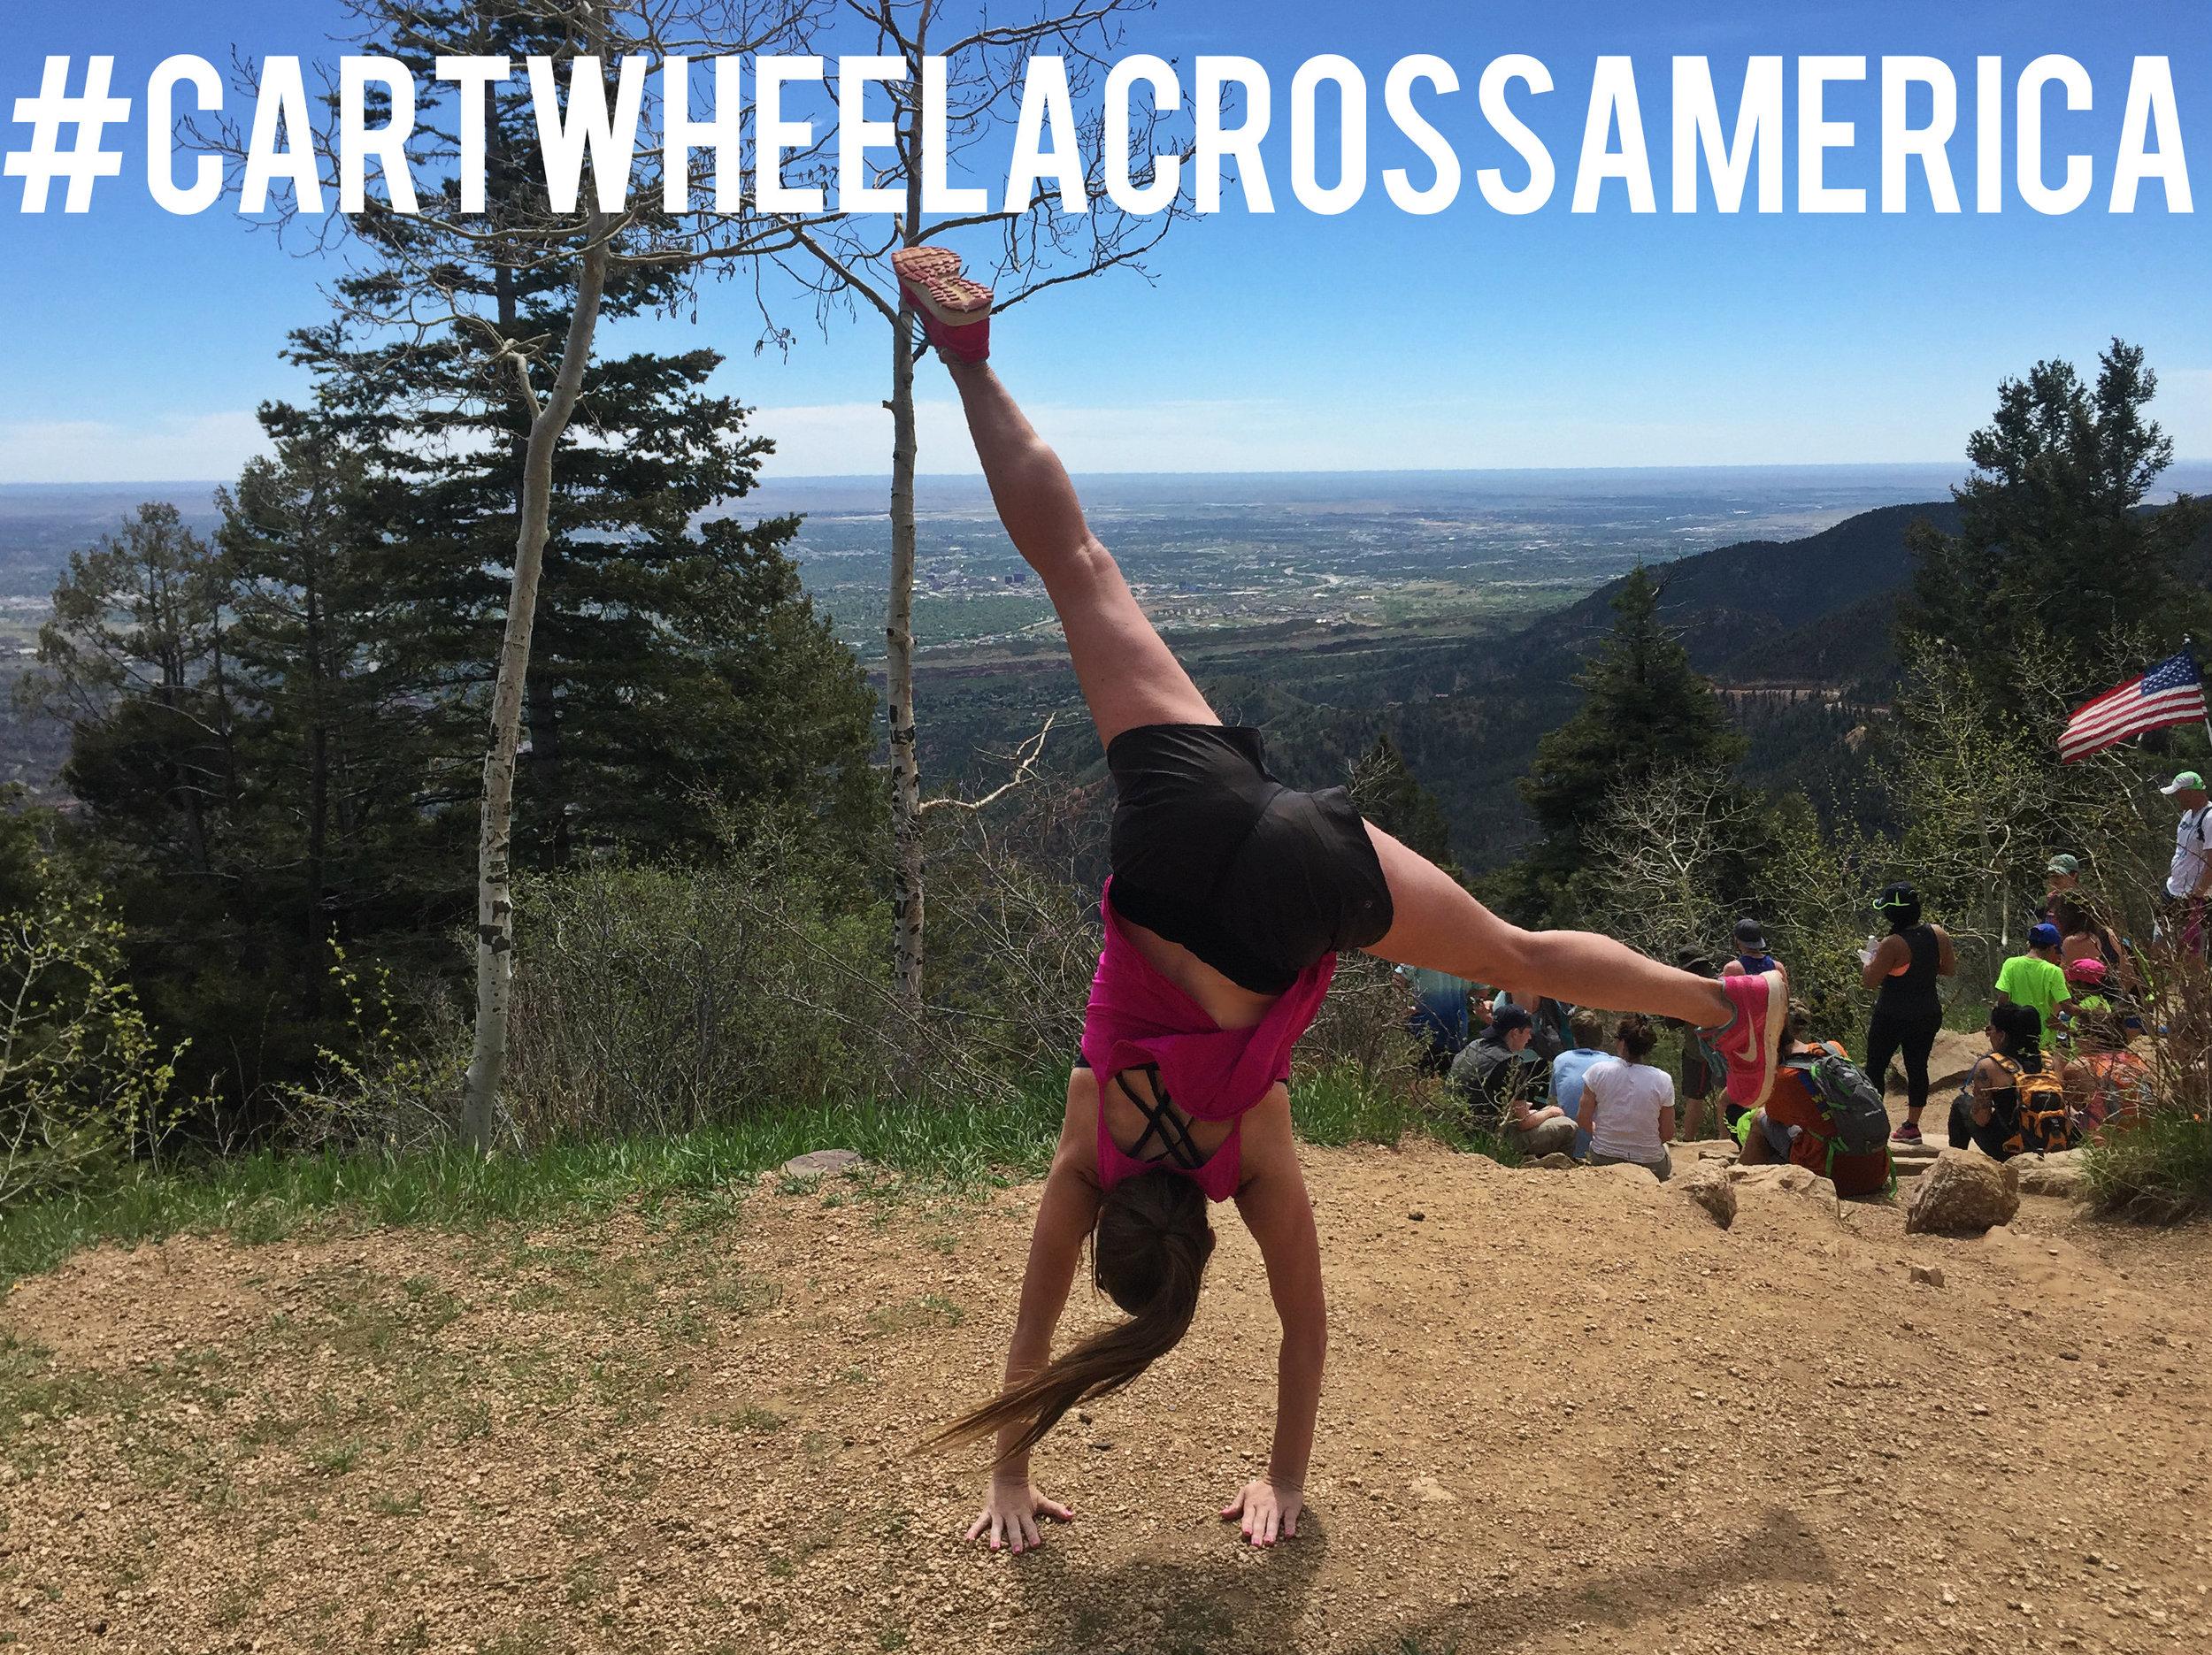 cartwheel across america